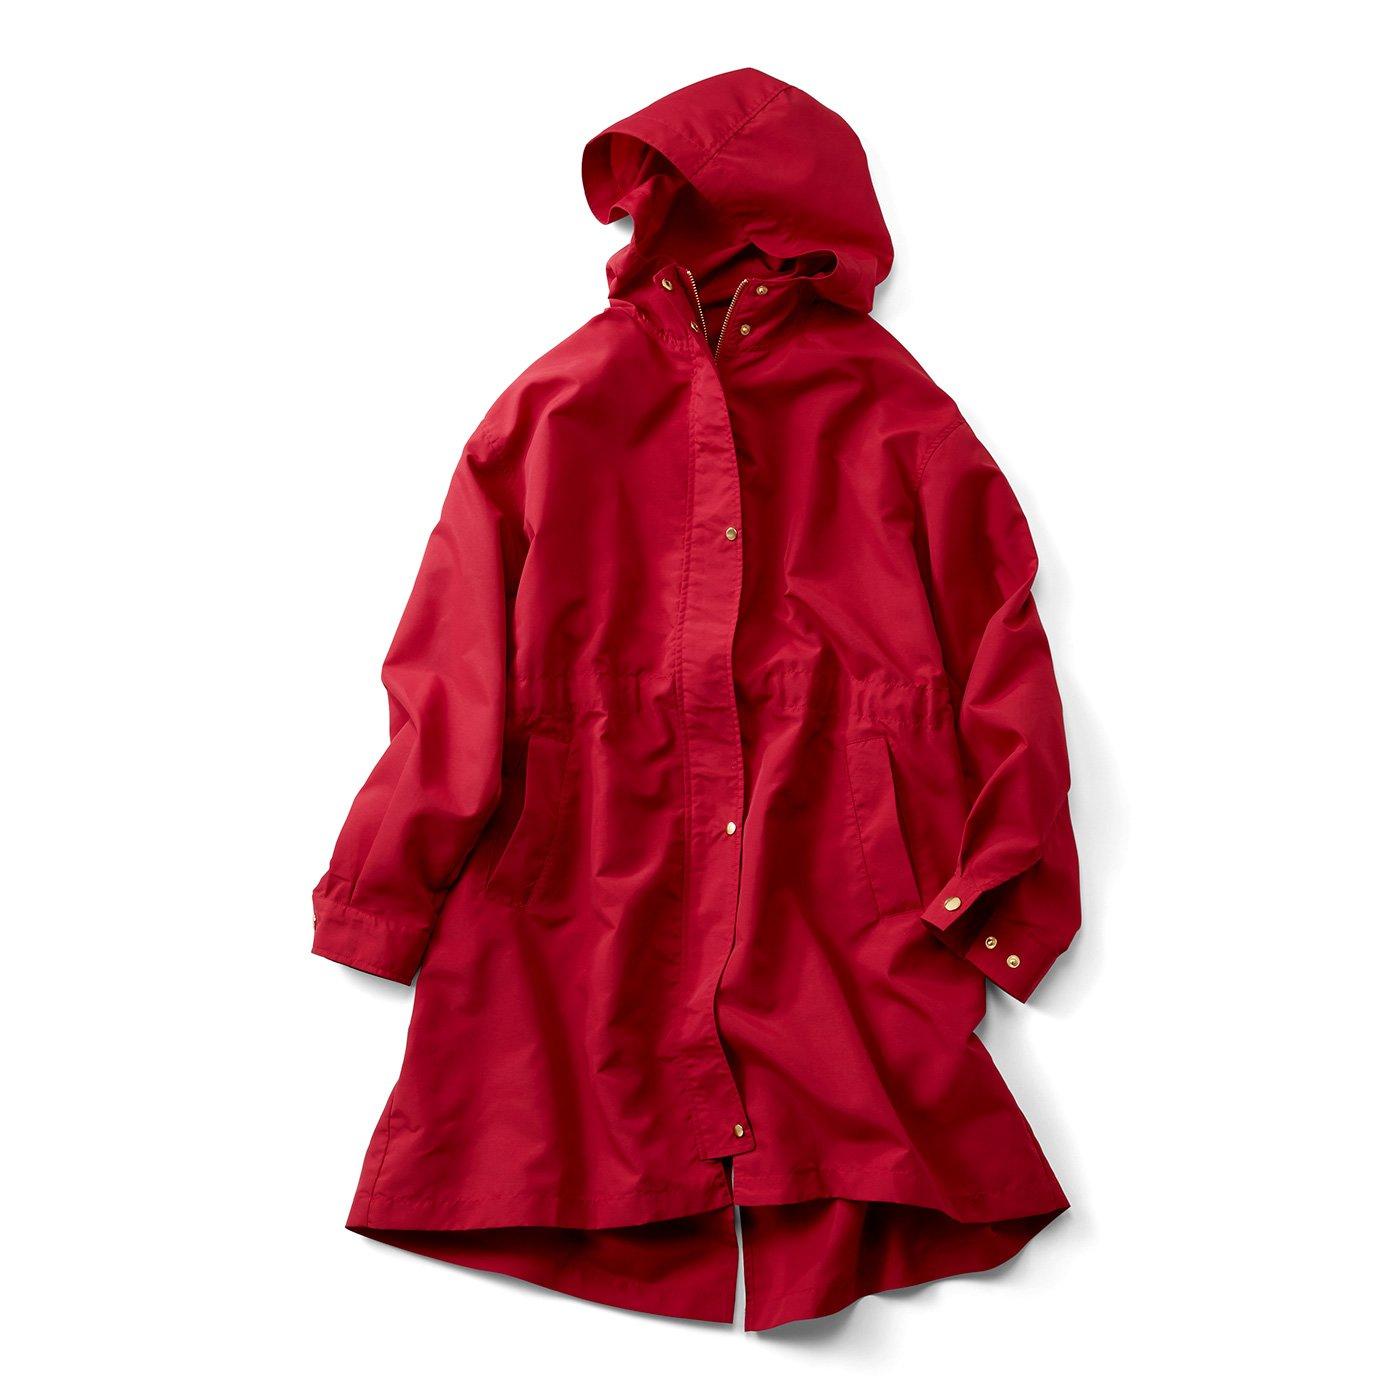 IEDIT[イディット] 花粉がつきにくくて多機能がうれしい 背負えて便利なミドル丈フーデッドコート〈トマトレッド〉